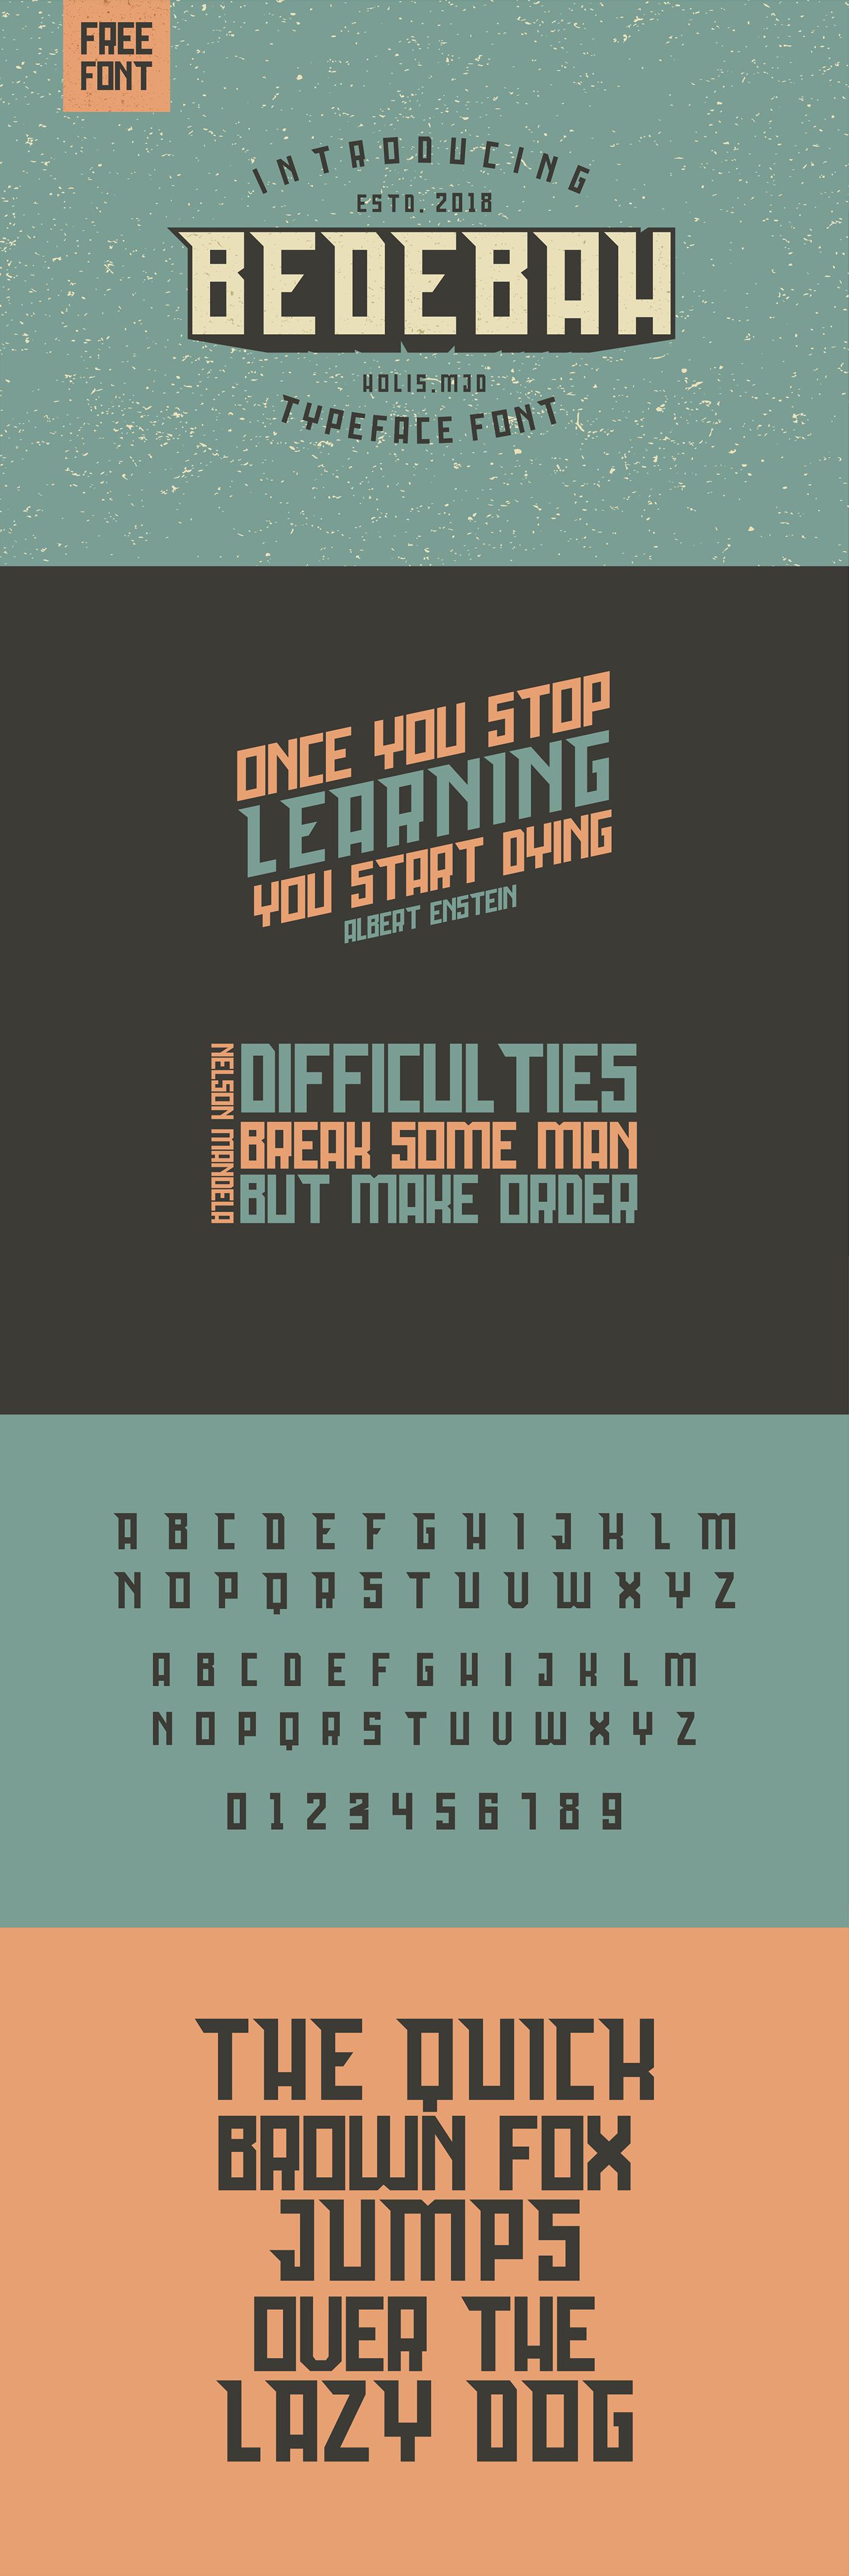 Free Bedebah Typeface - Slab Serif Fonts